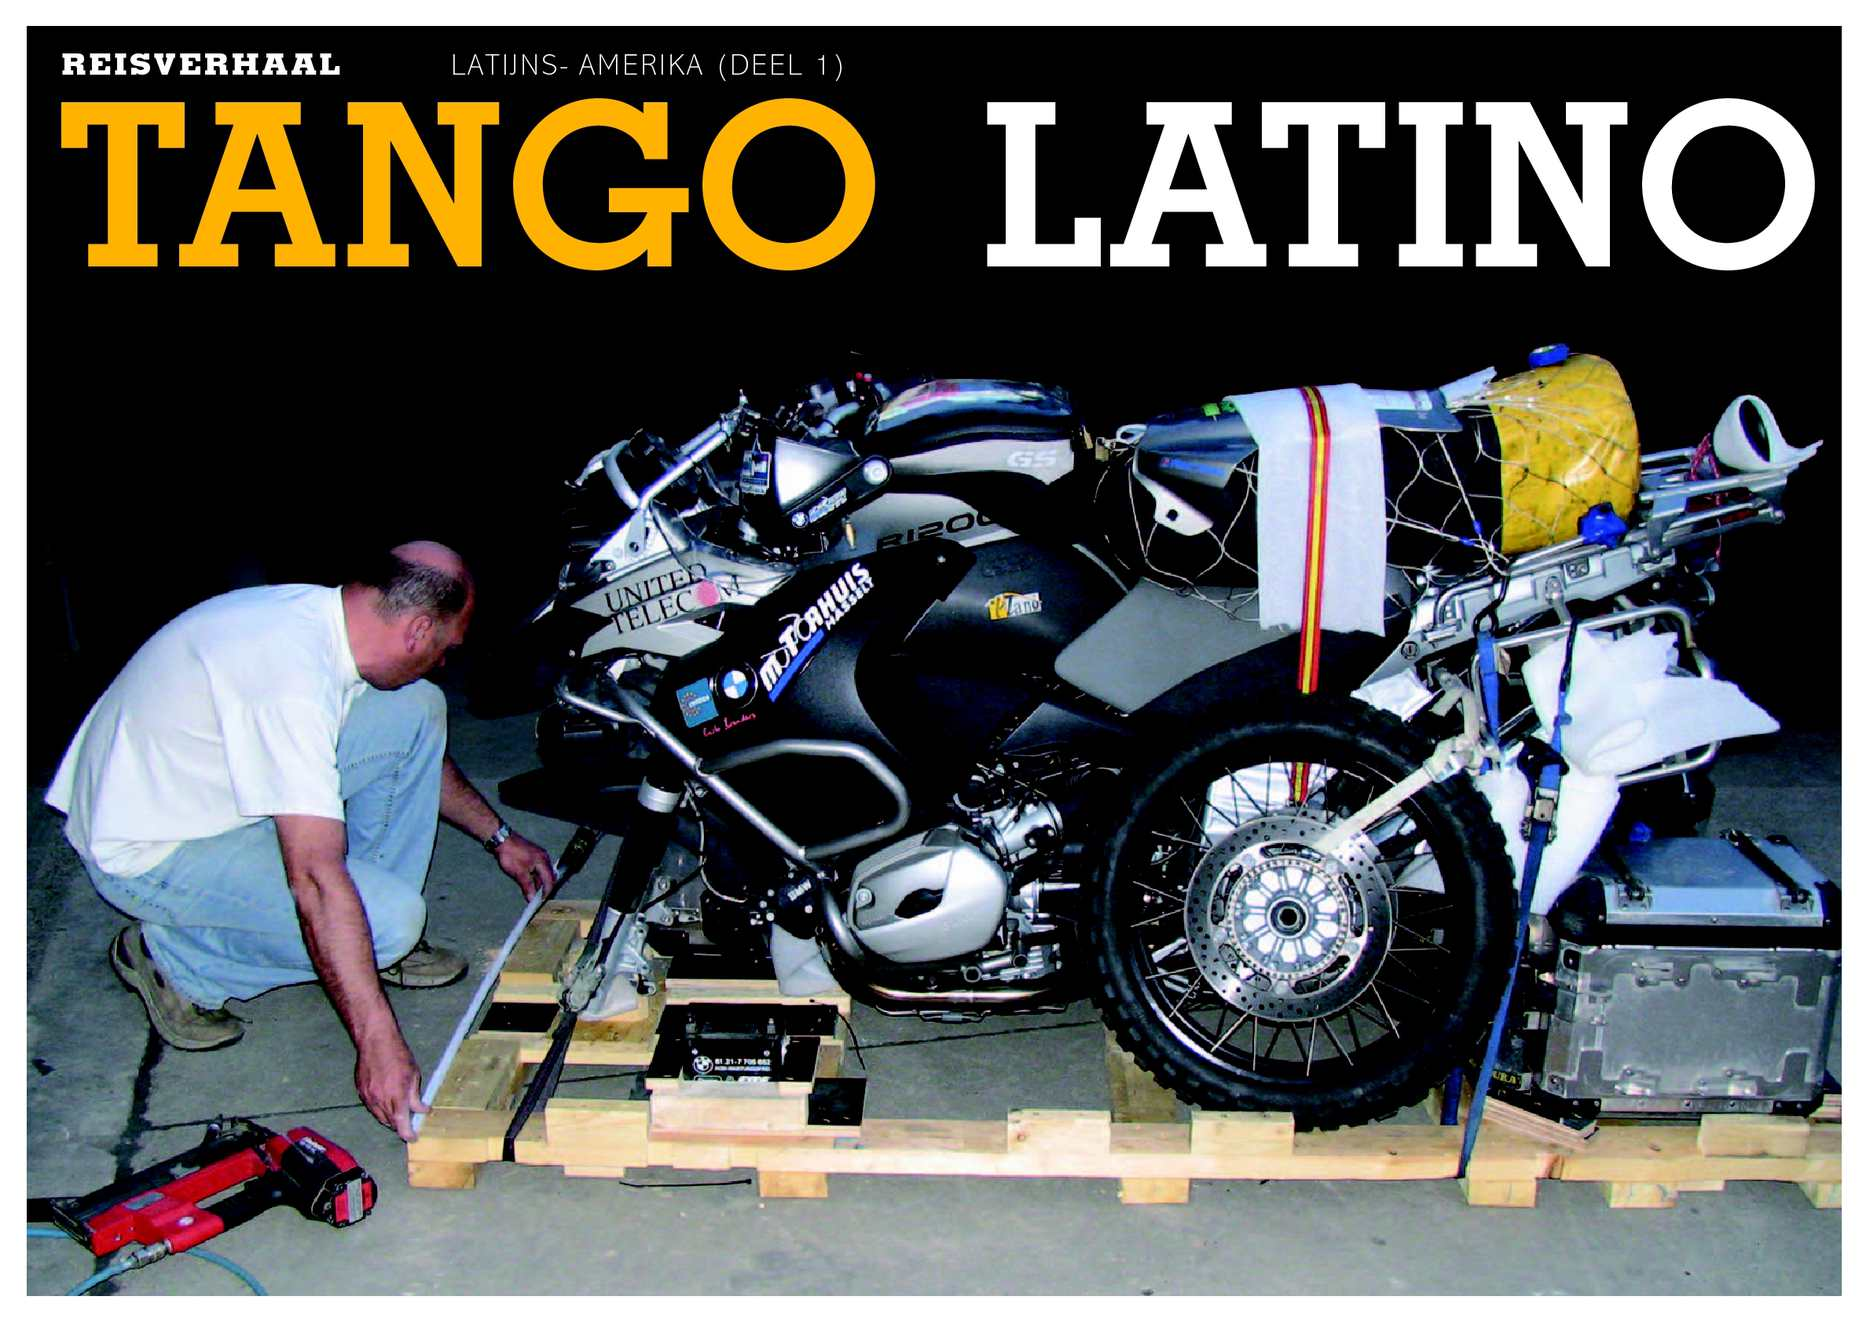 BMW Motorrad reisverhaal. Latijns-Amerika